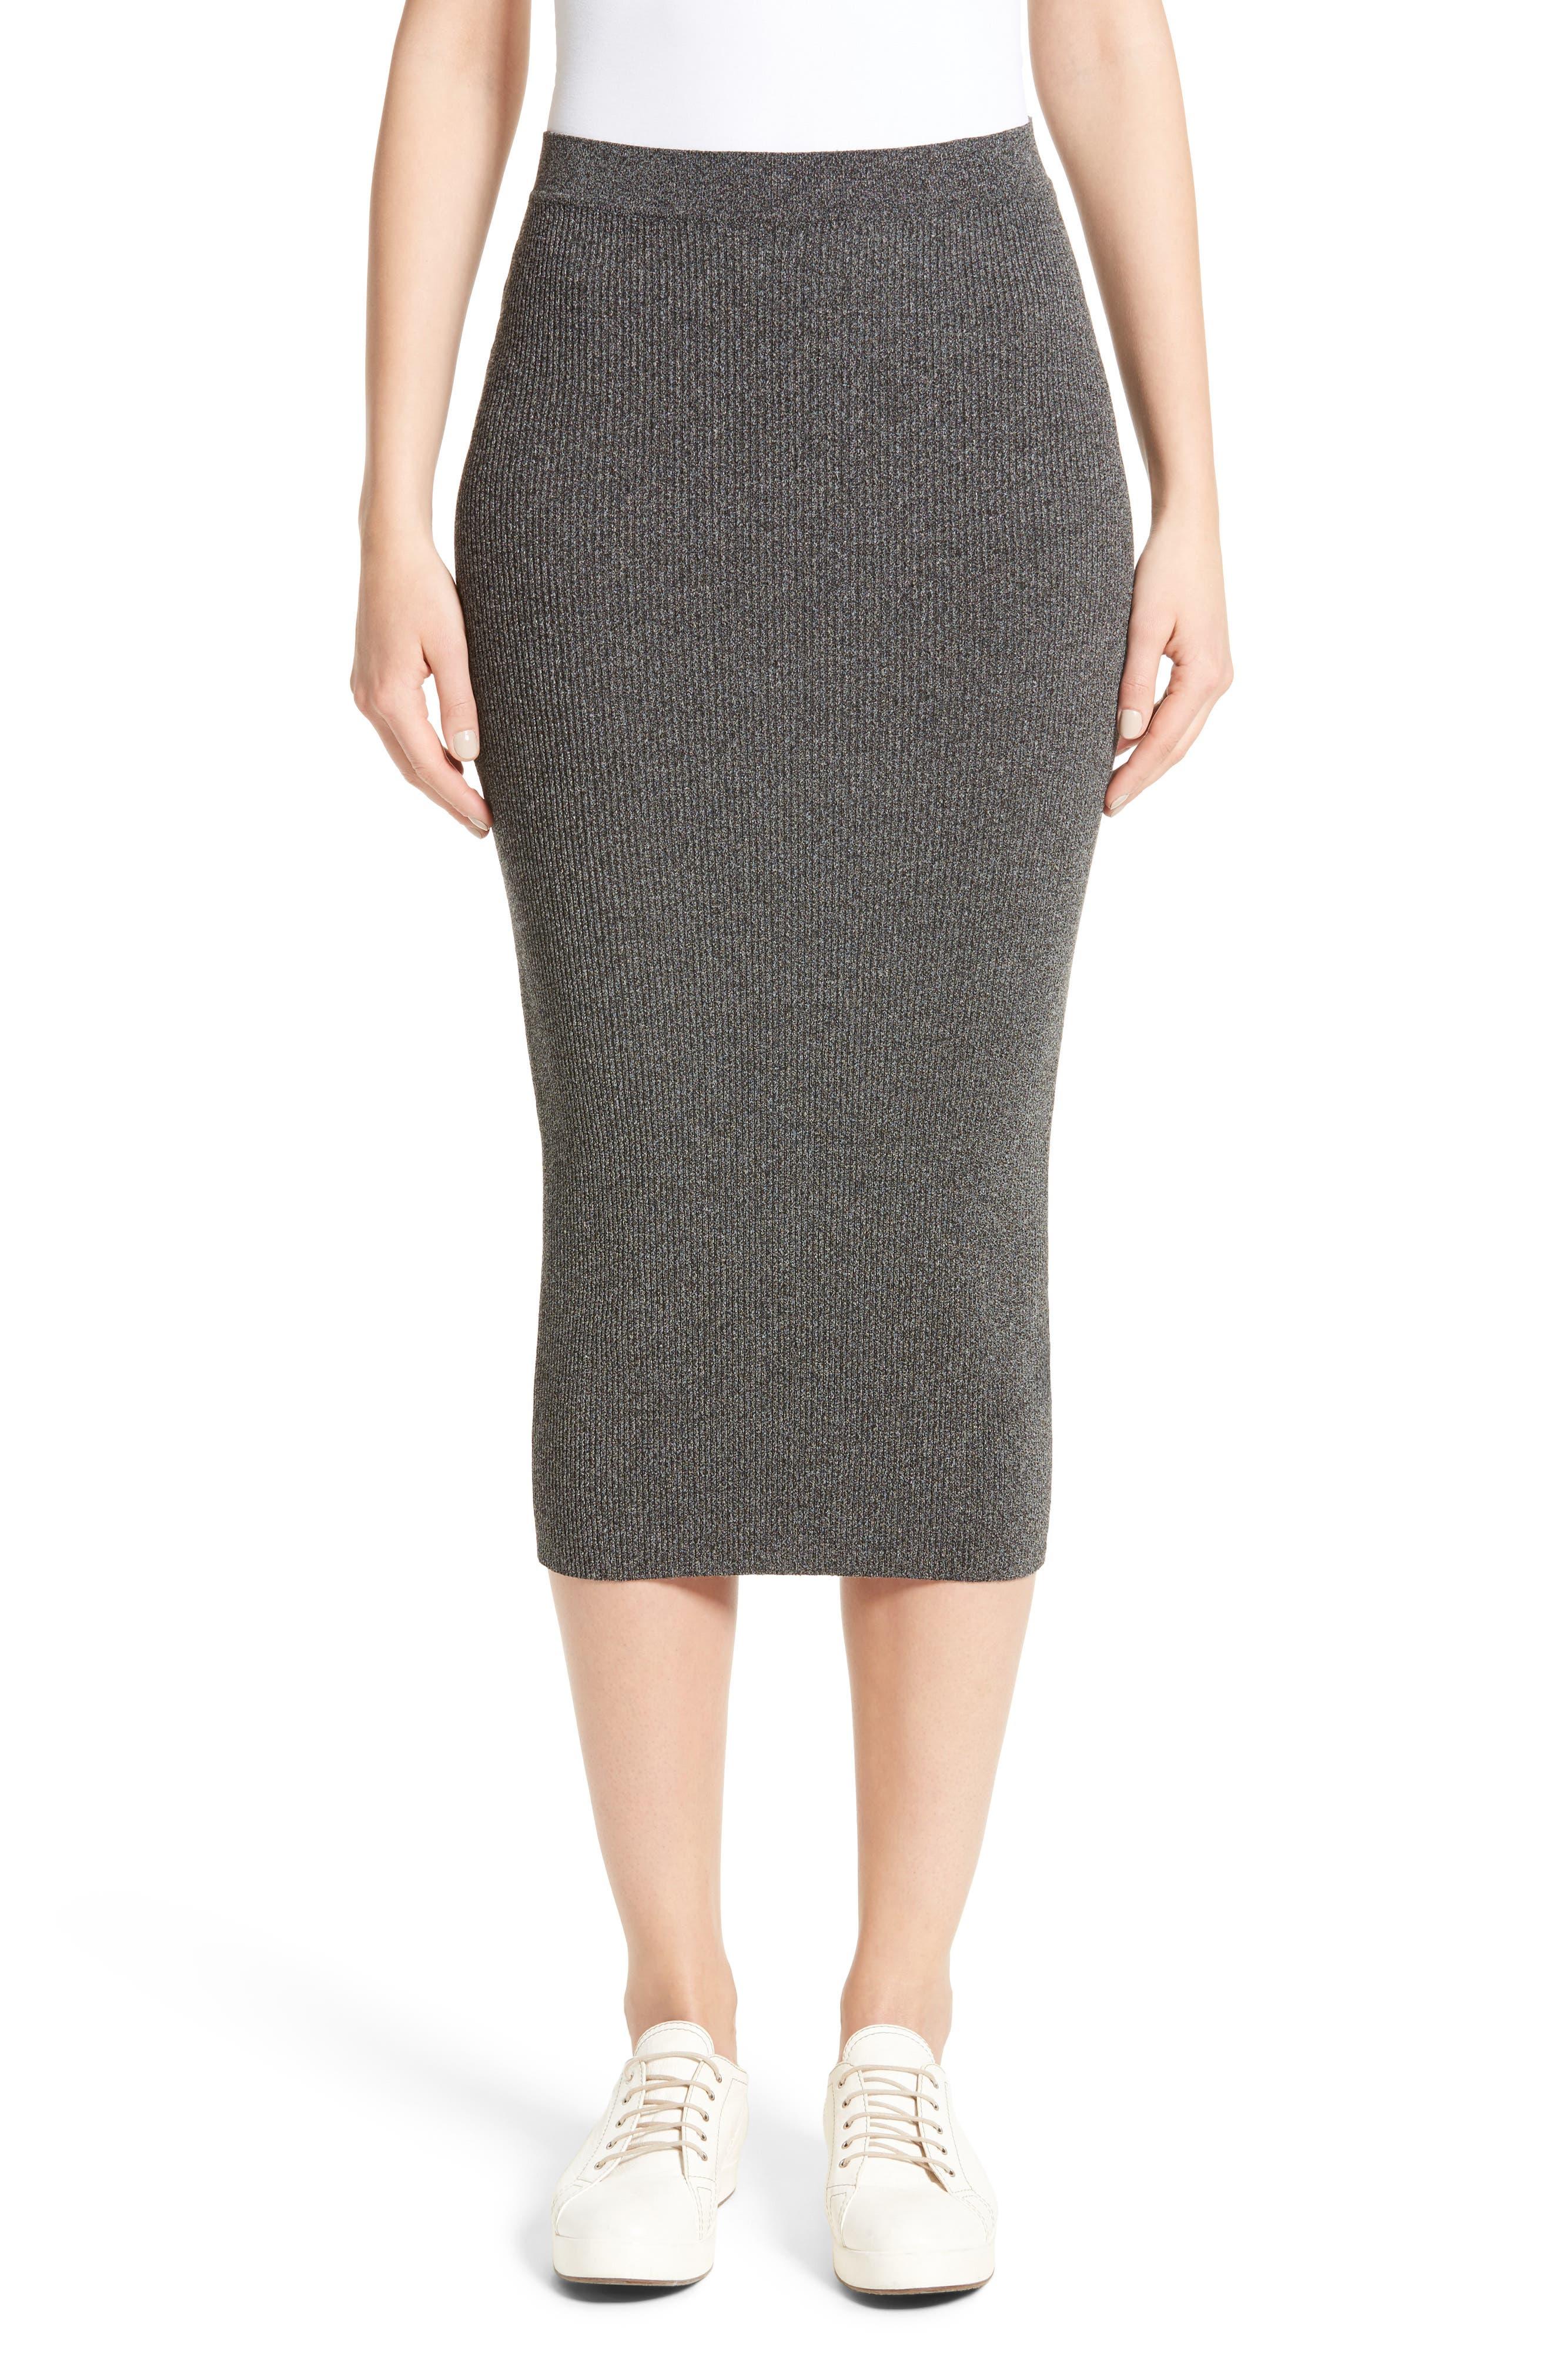 Armani Jeans Rib Knit Midi Skirt,                         Main,                         color, Grey